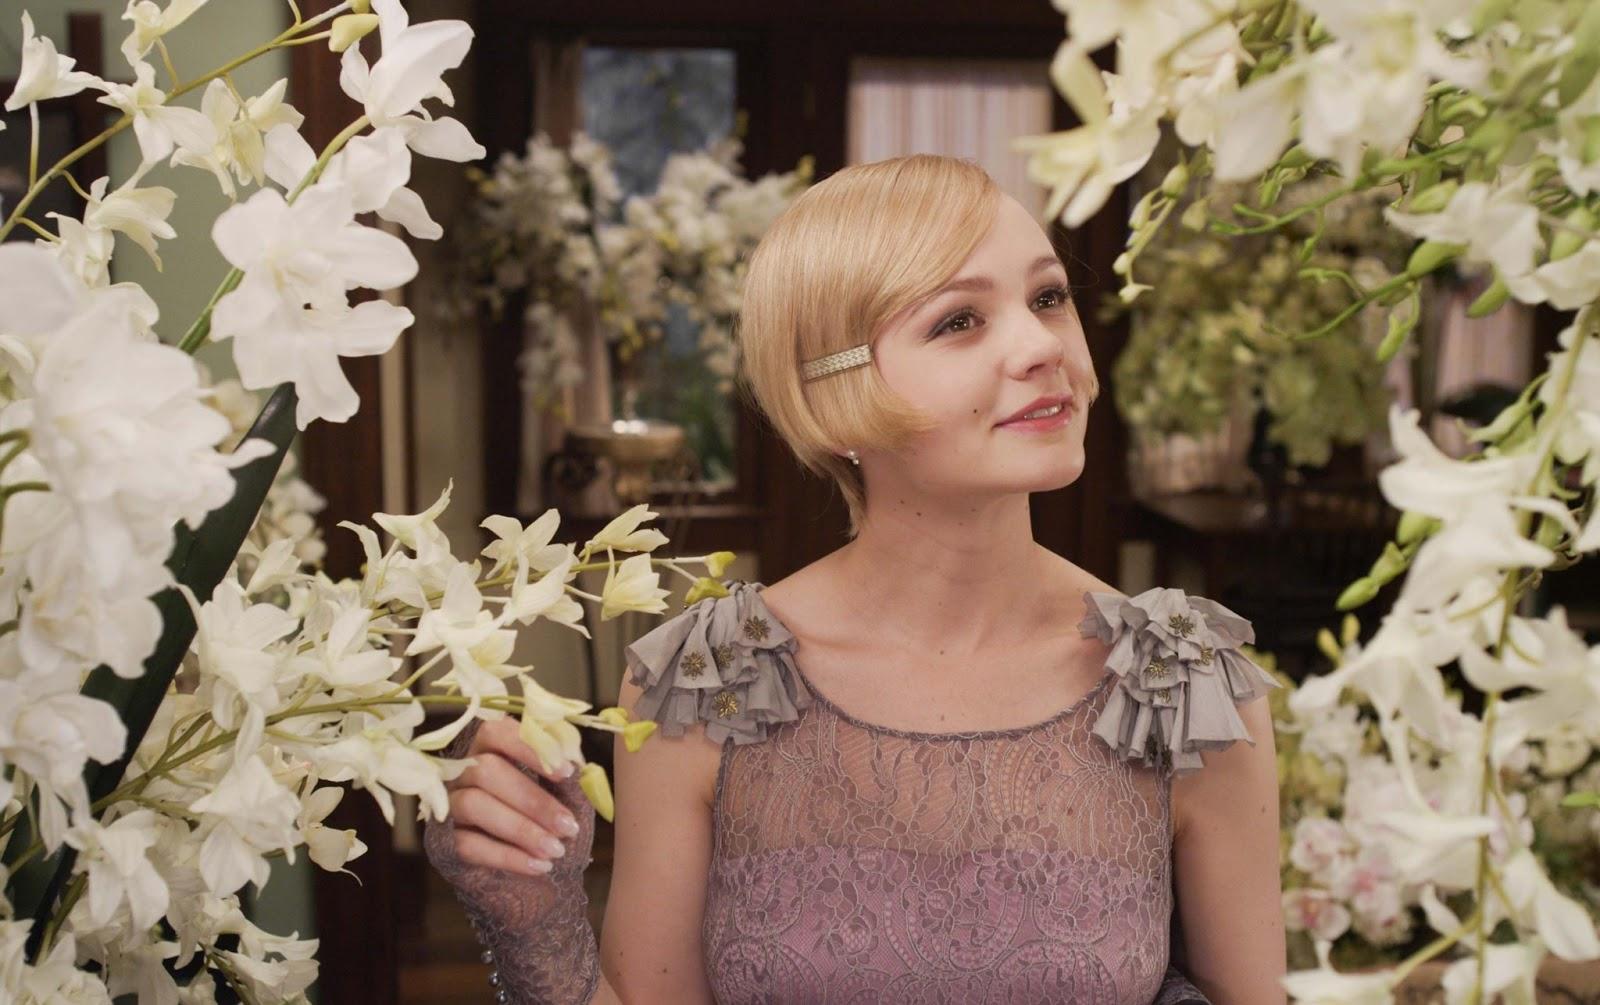 Carey-Mulligan-The-Great-Gatsby-Best-Actress-2013.jpg